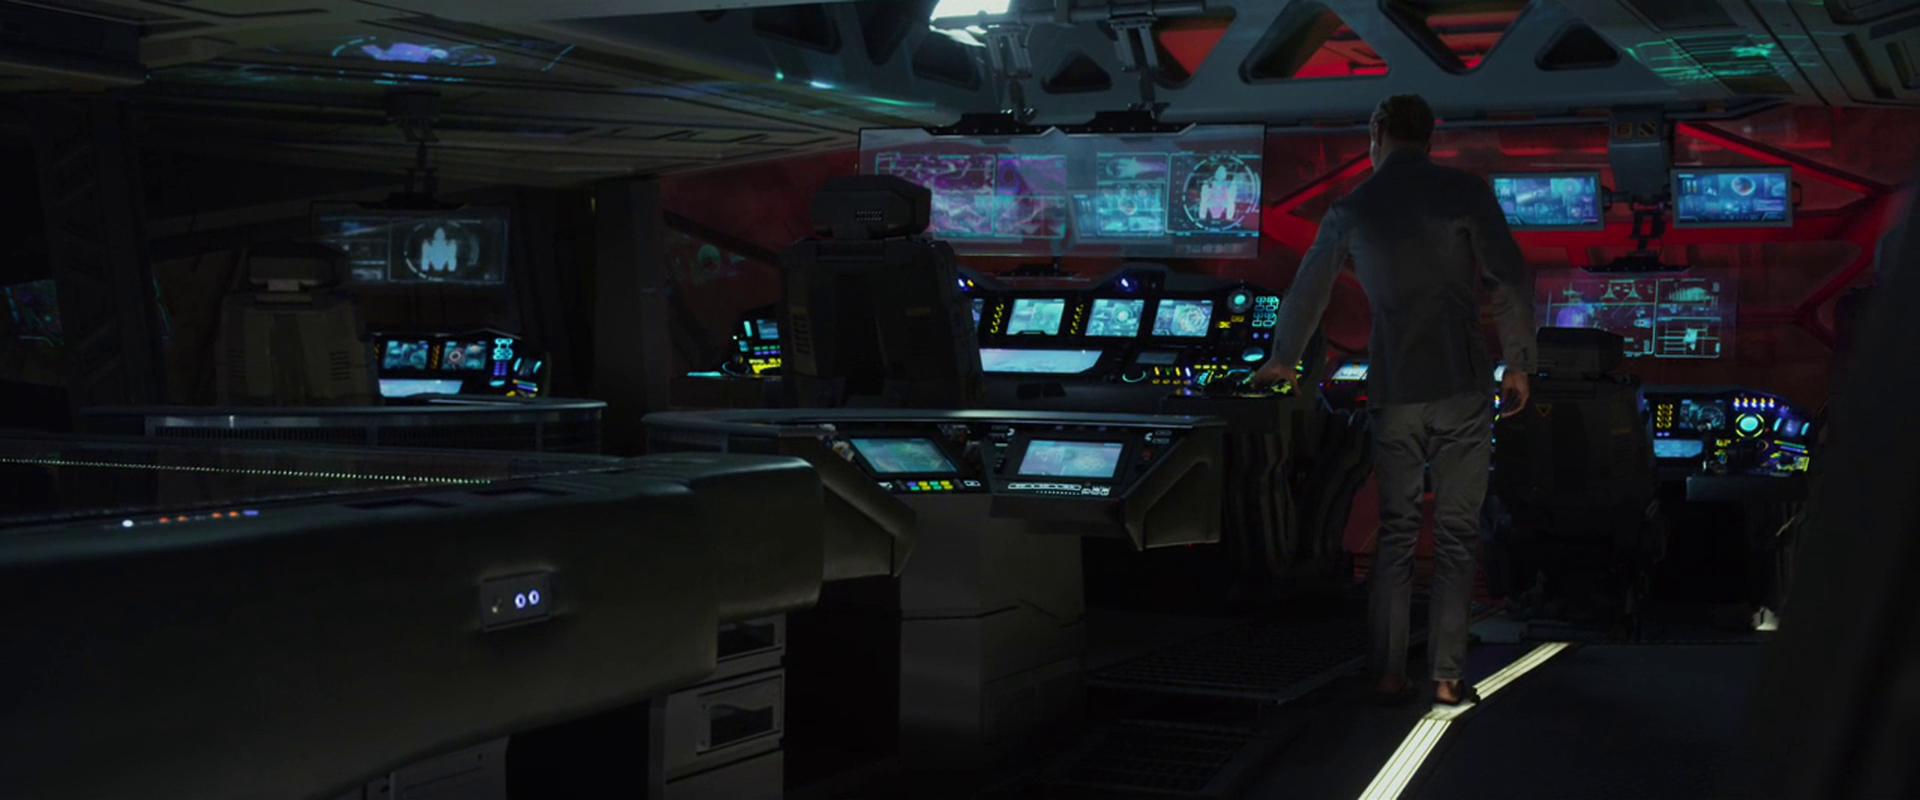 Star Trek Inspired Control Center Under Construction